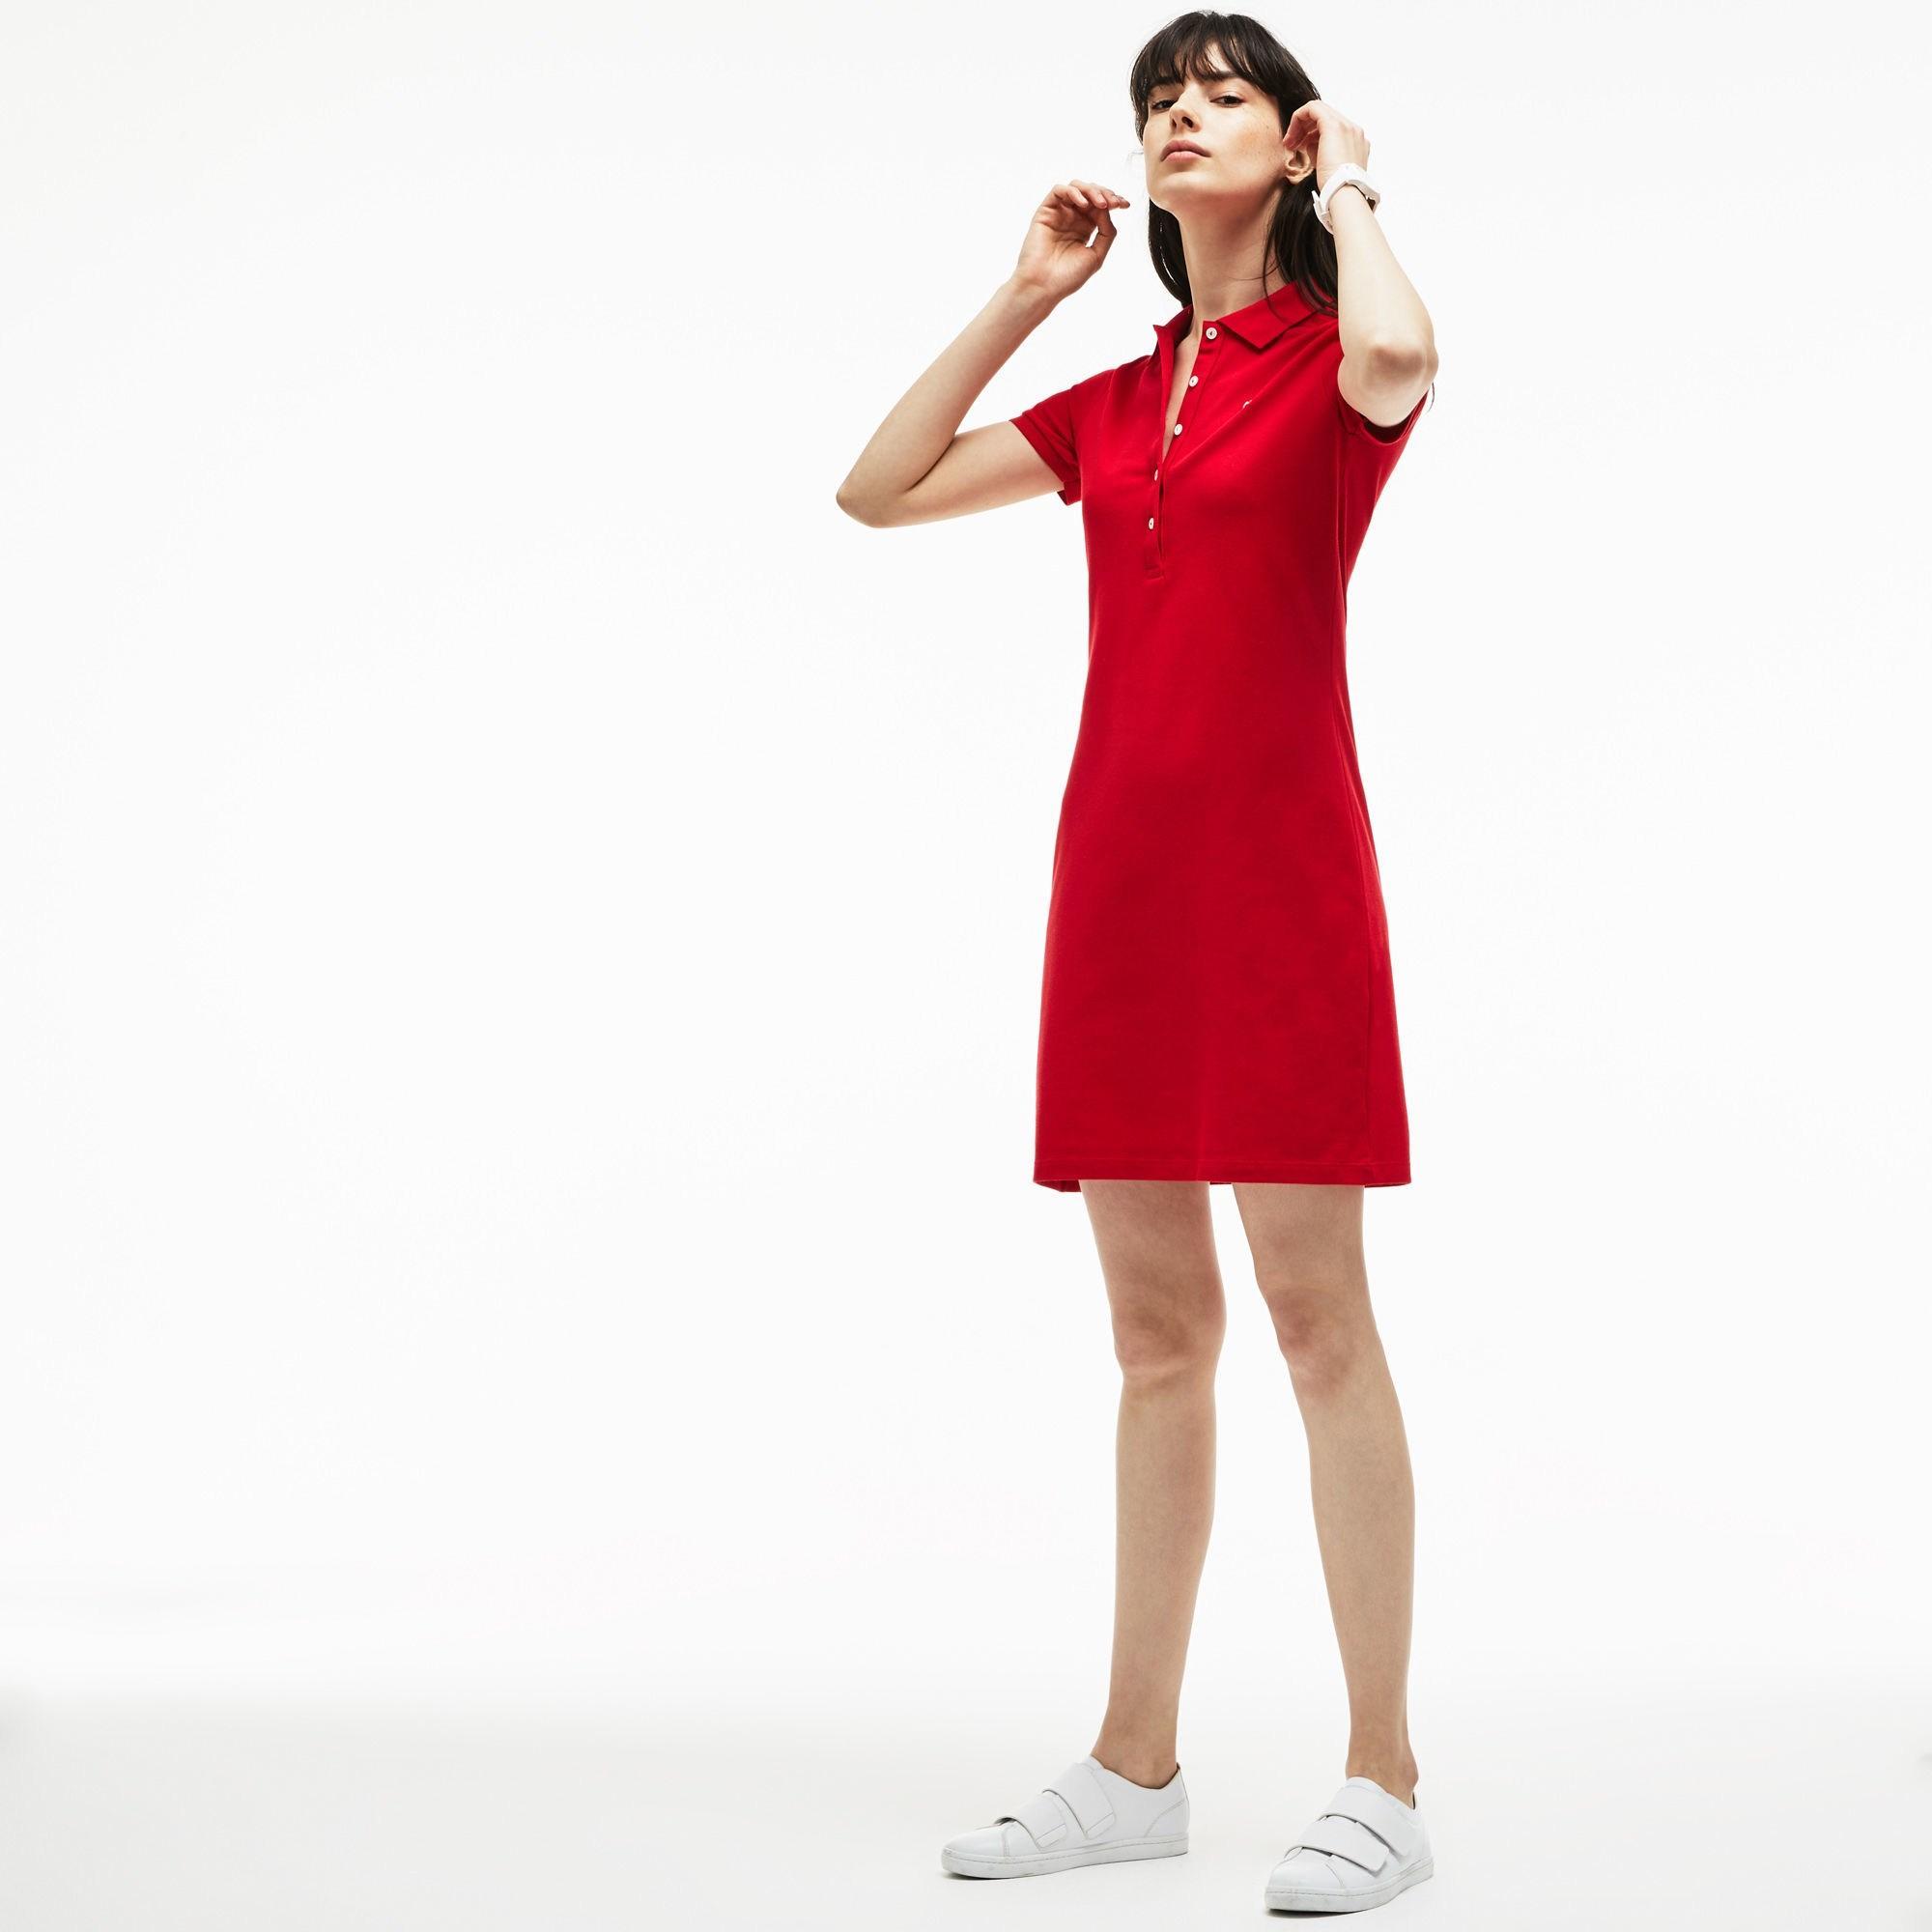 df38fcf48 Lacoste - Red Stretch Cotton Mini Piqué Polo Dress - Lyst. View fullscreen